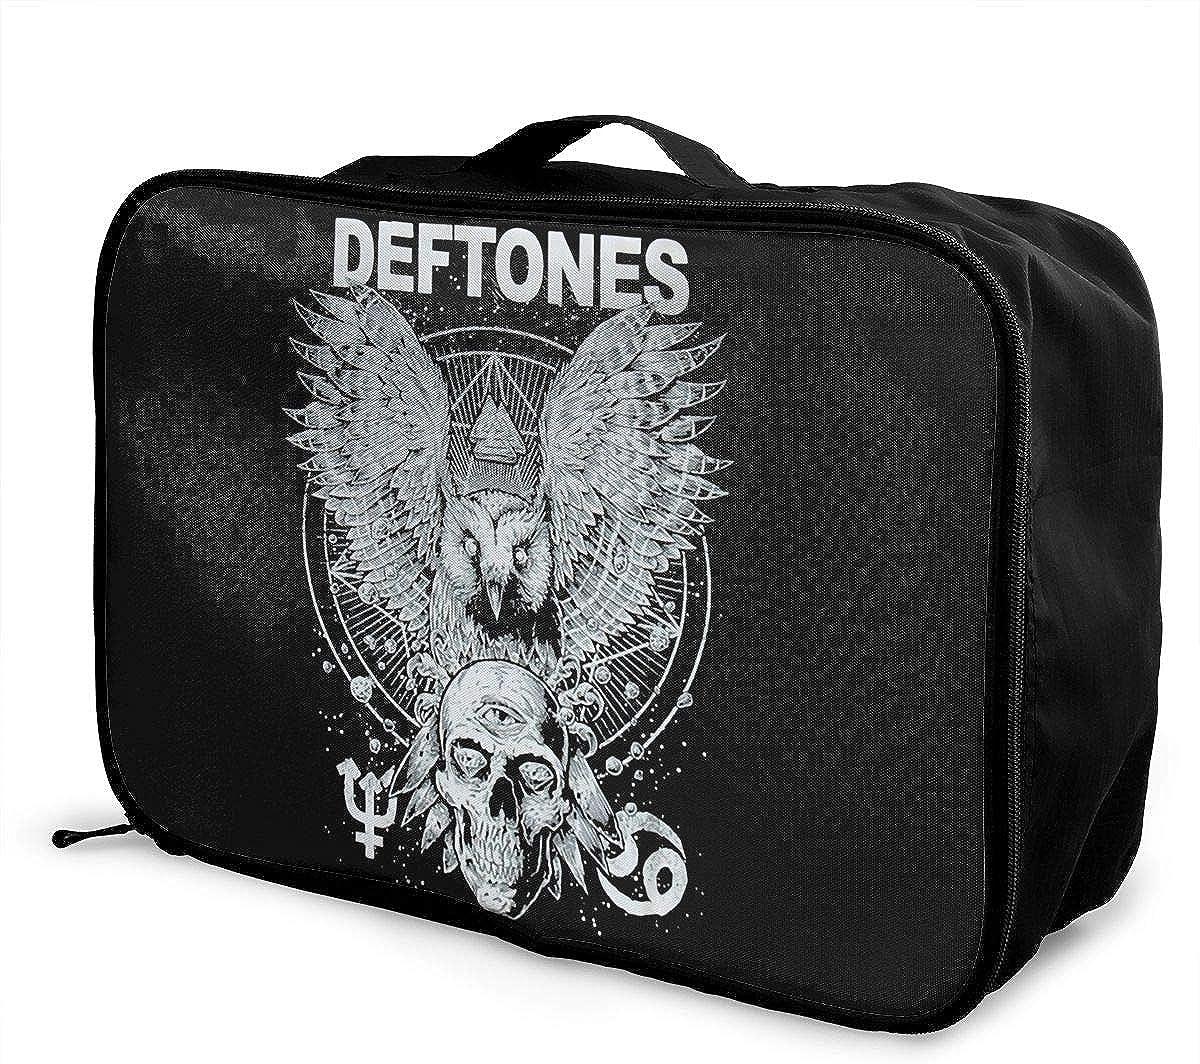 Deftones School Backpack Unisex School Bag Canvas Rucksack Laptop Book Bag Satchel Hiking Bag for Boys Girls